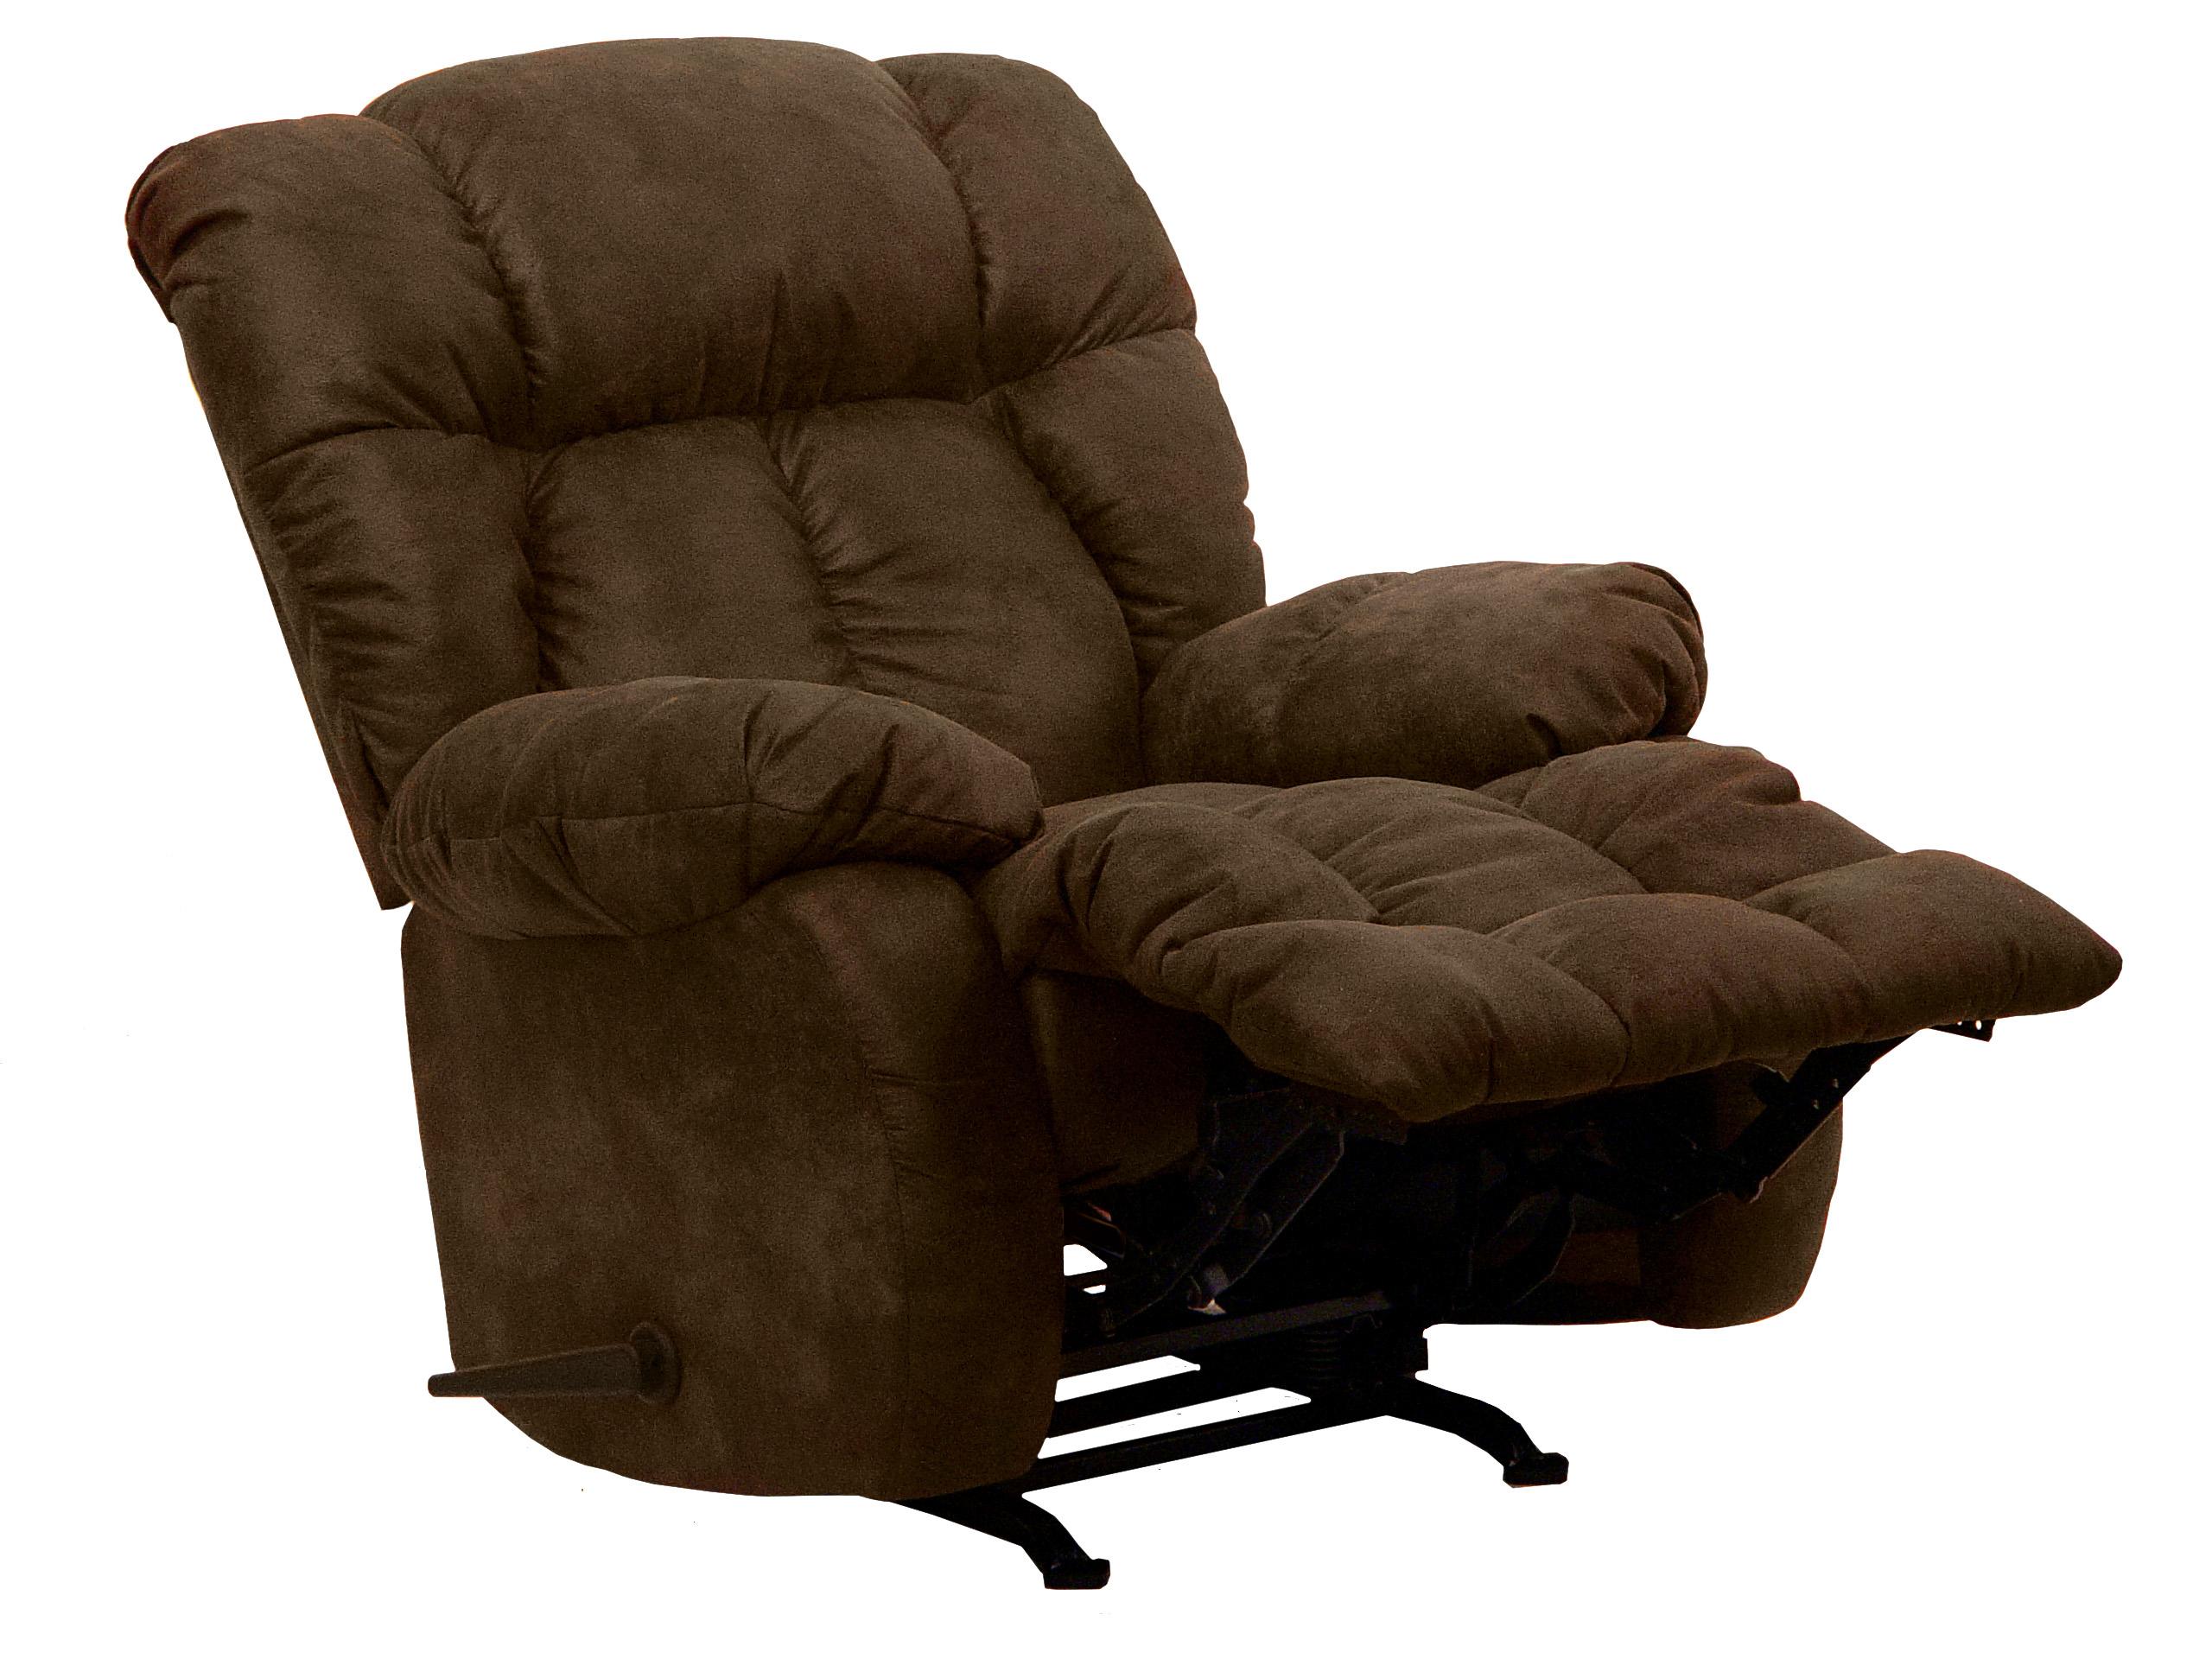 Laredo TV fotel